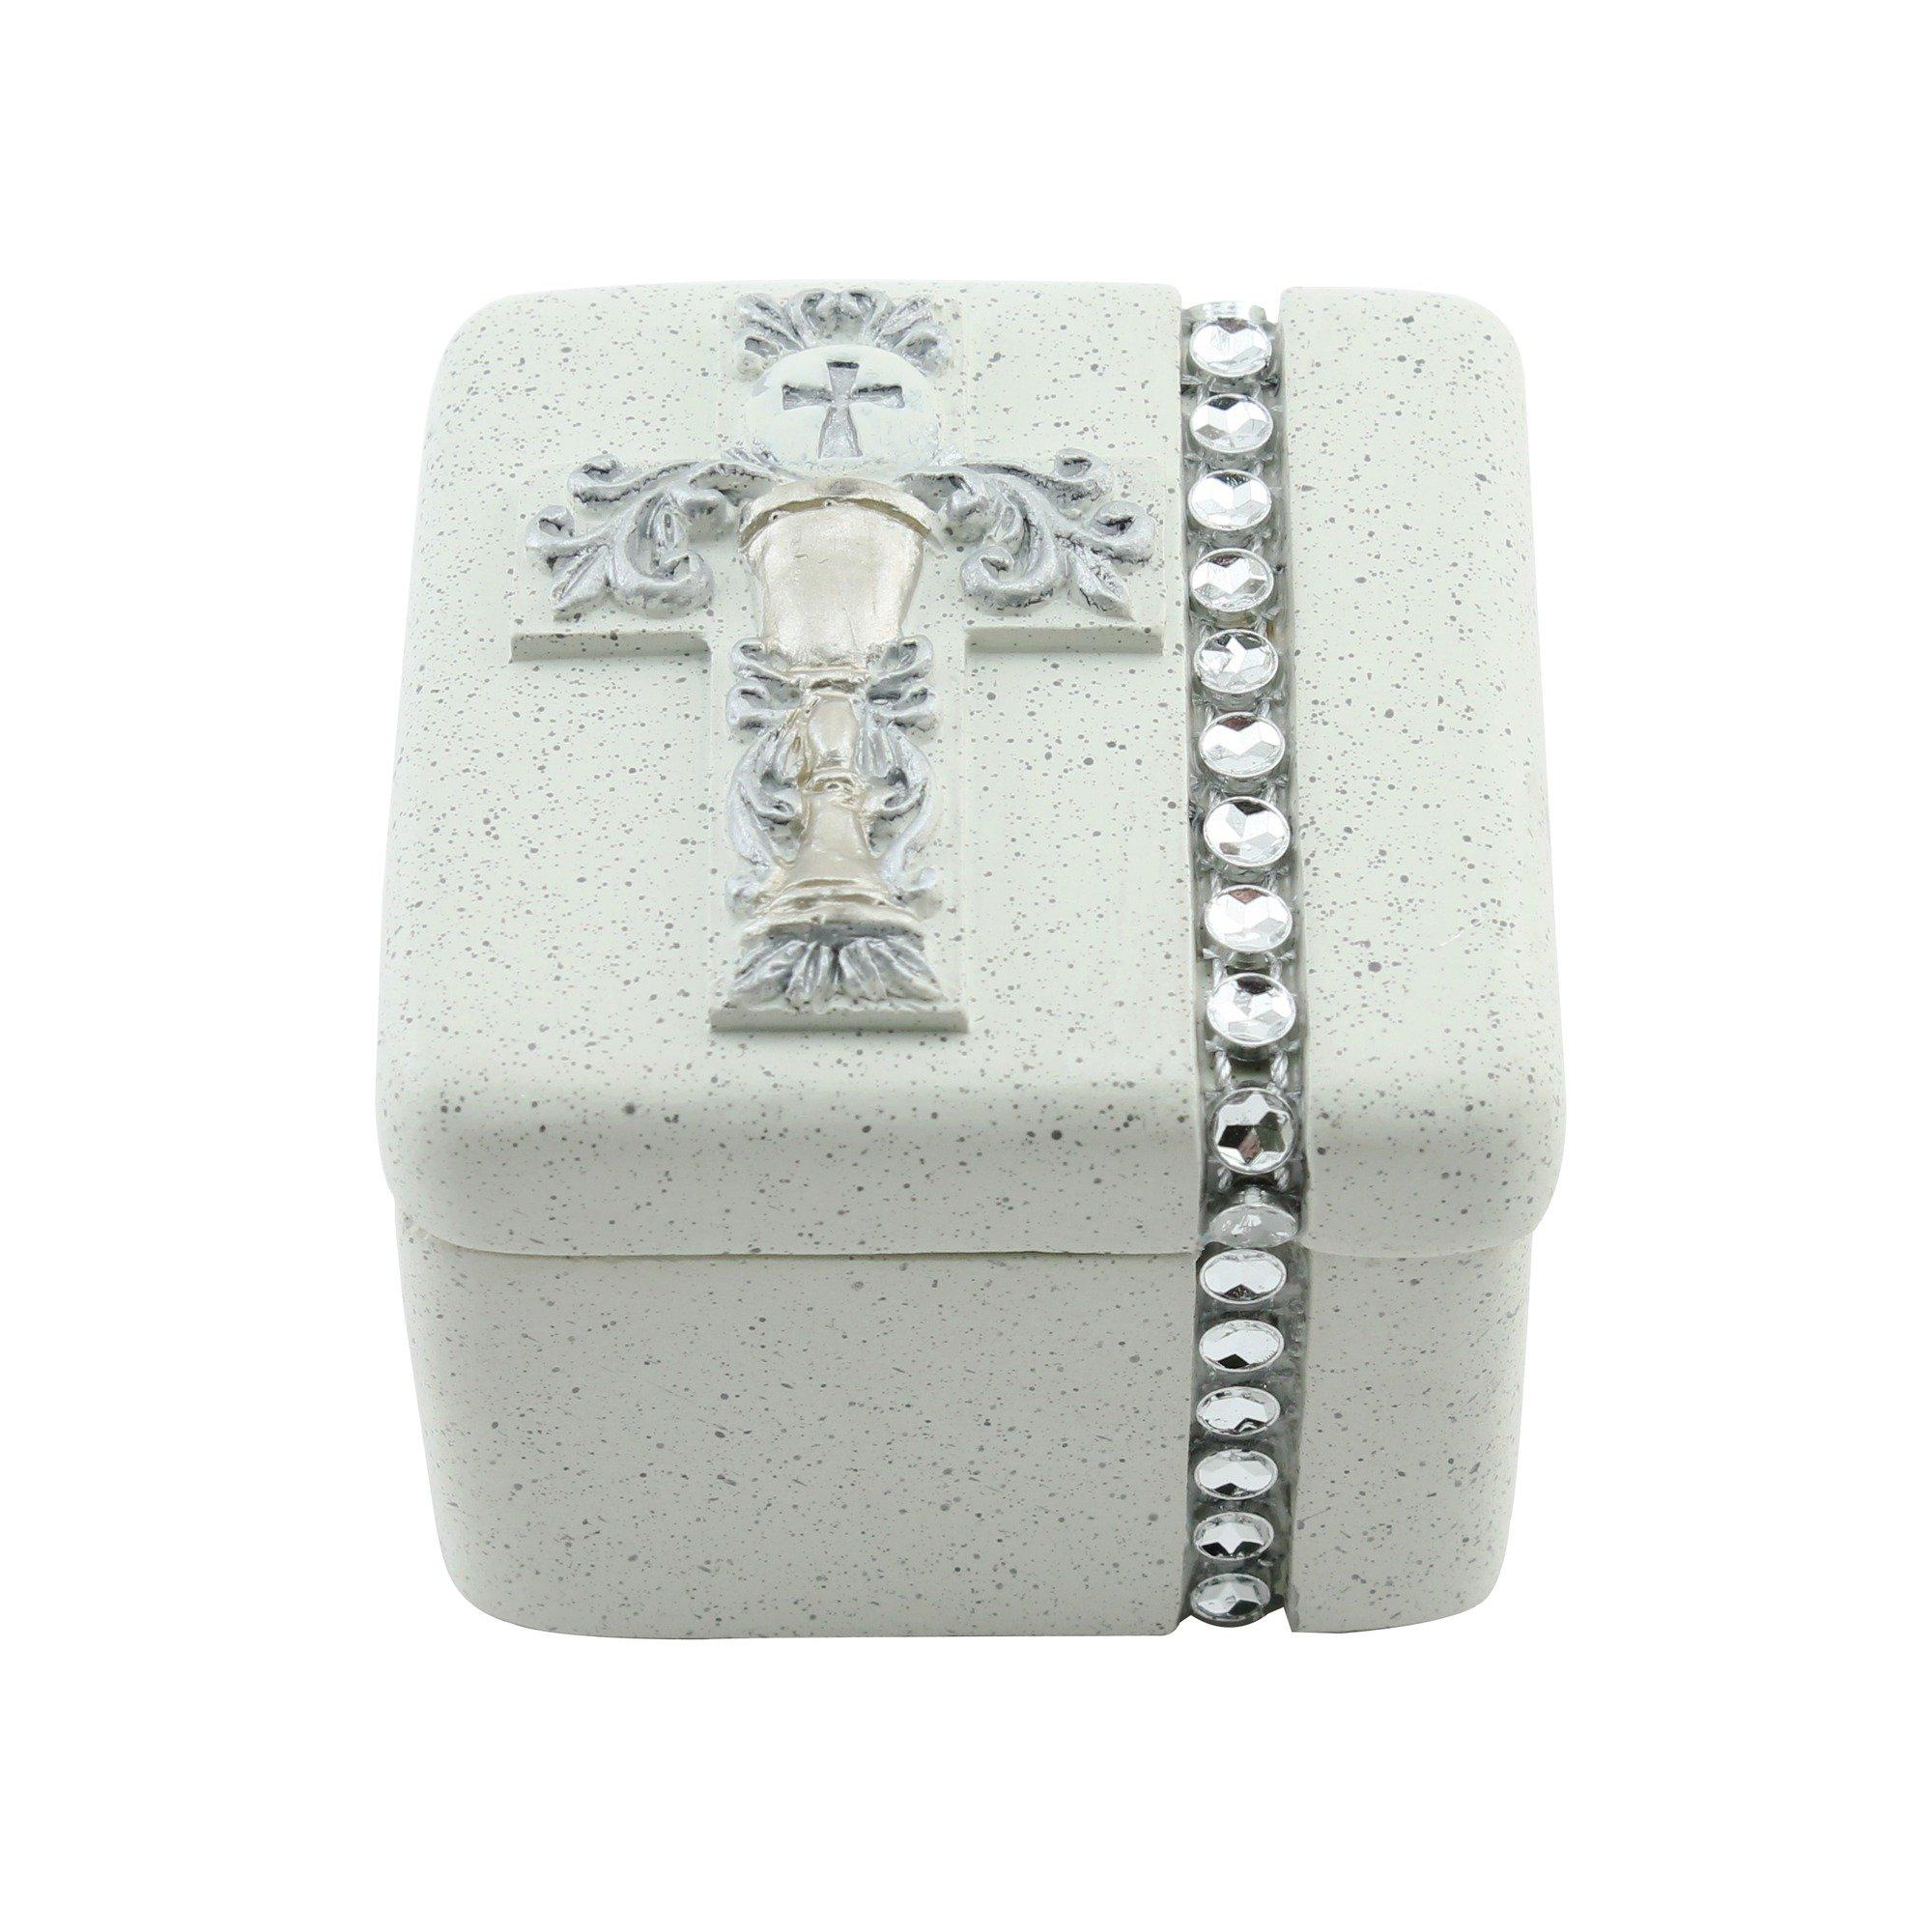 Roman First Holy Communion Silver Chalice 2 x 2 Inch Resin Stone Keepsake Rosary Jewelry Box